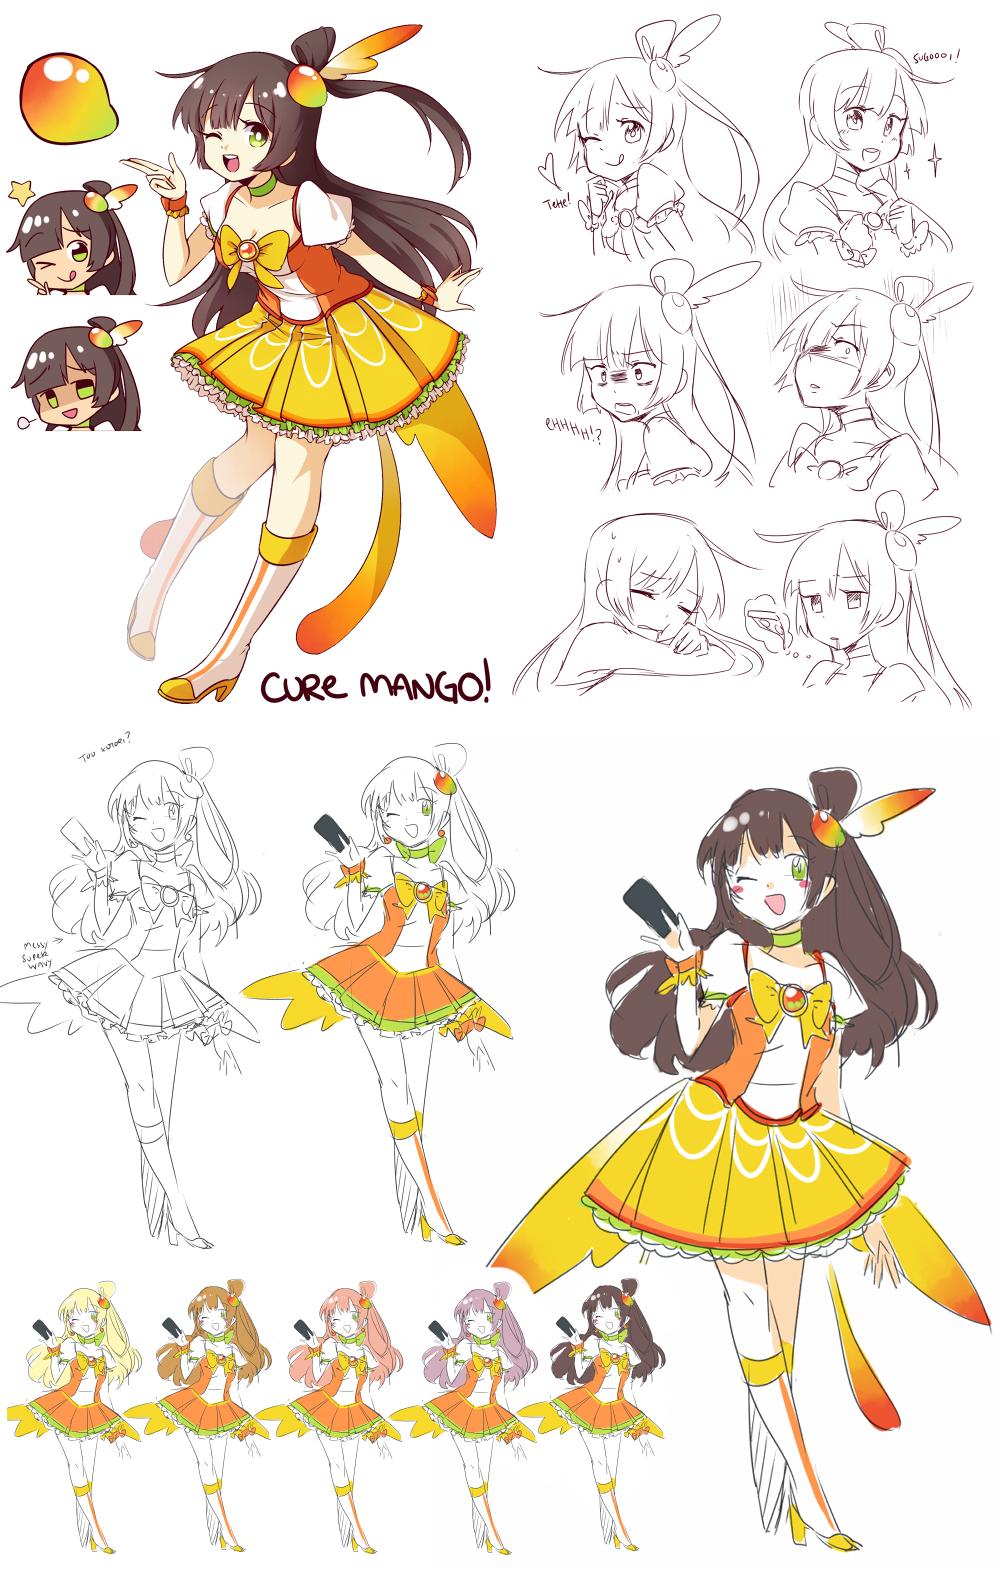 Cure Mango